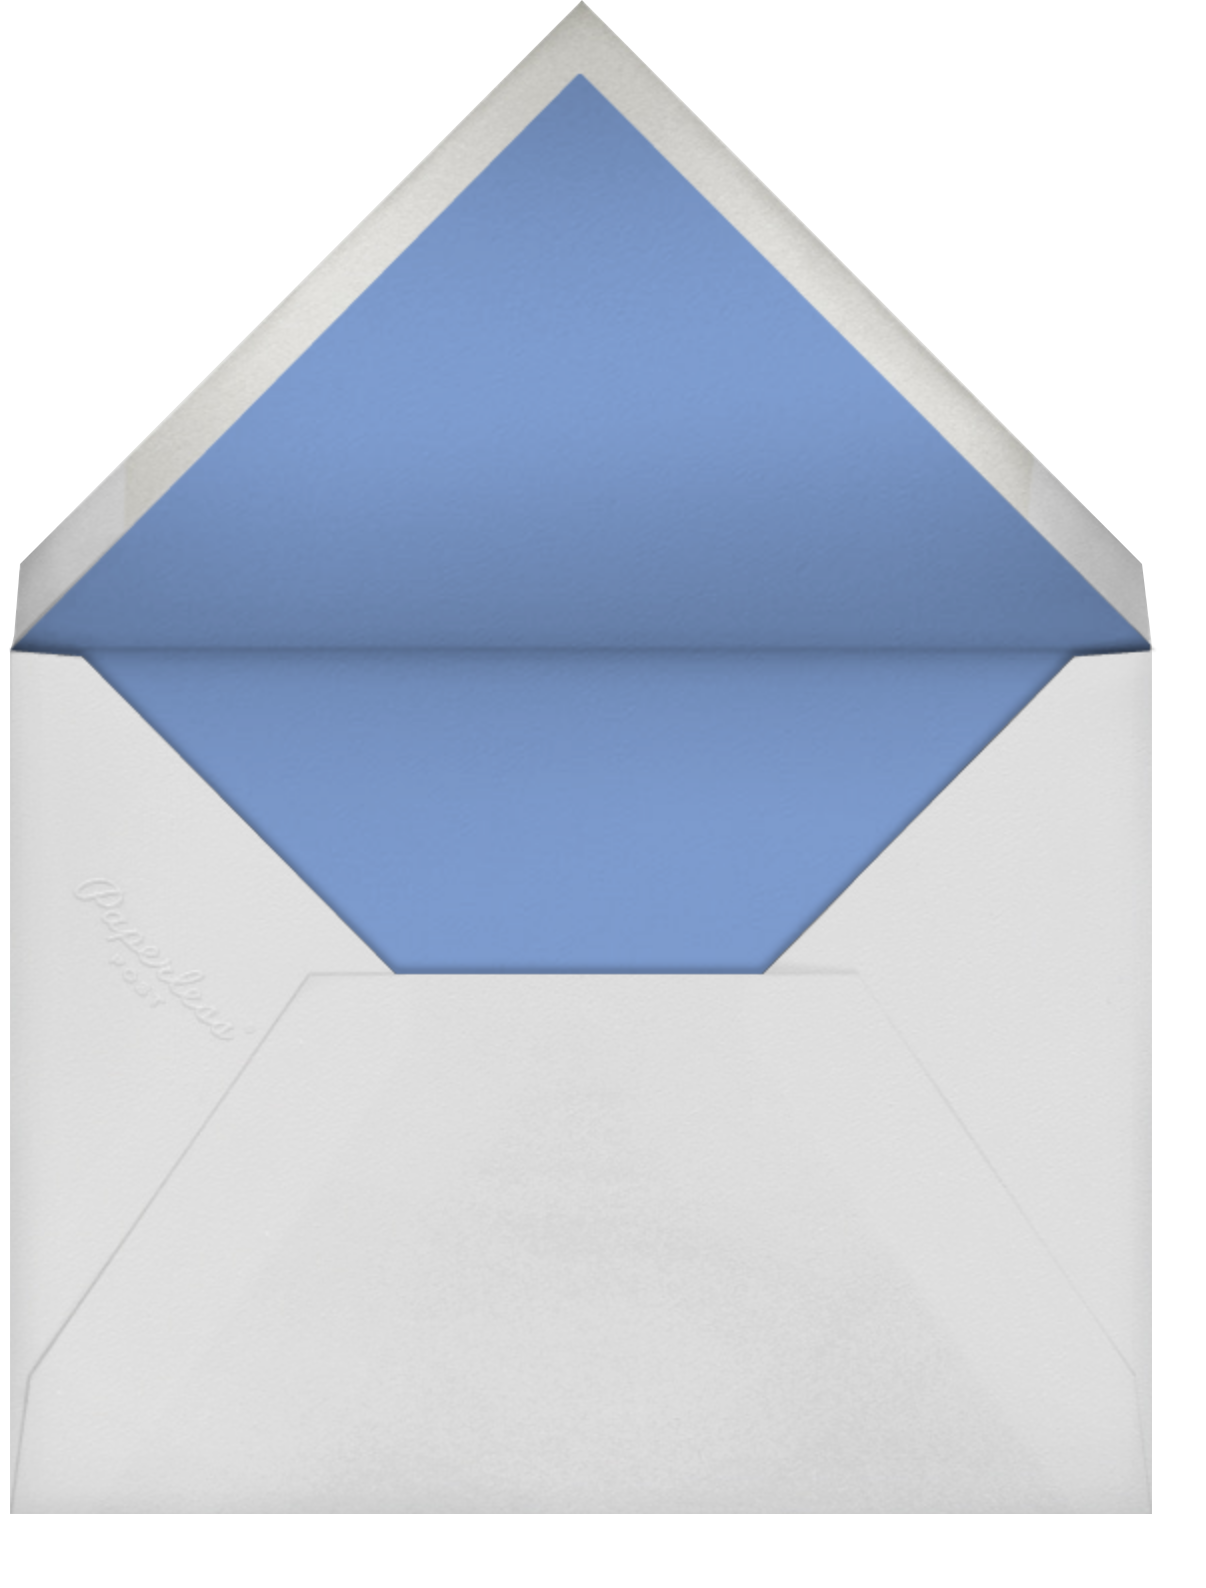 Ottoman Floral - White/Lapis - Oscar de la Renta - General entertaining - envelope back